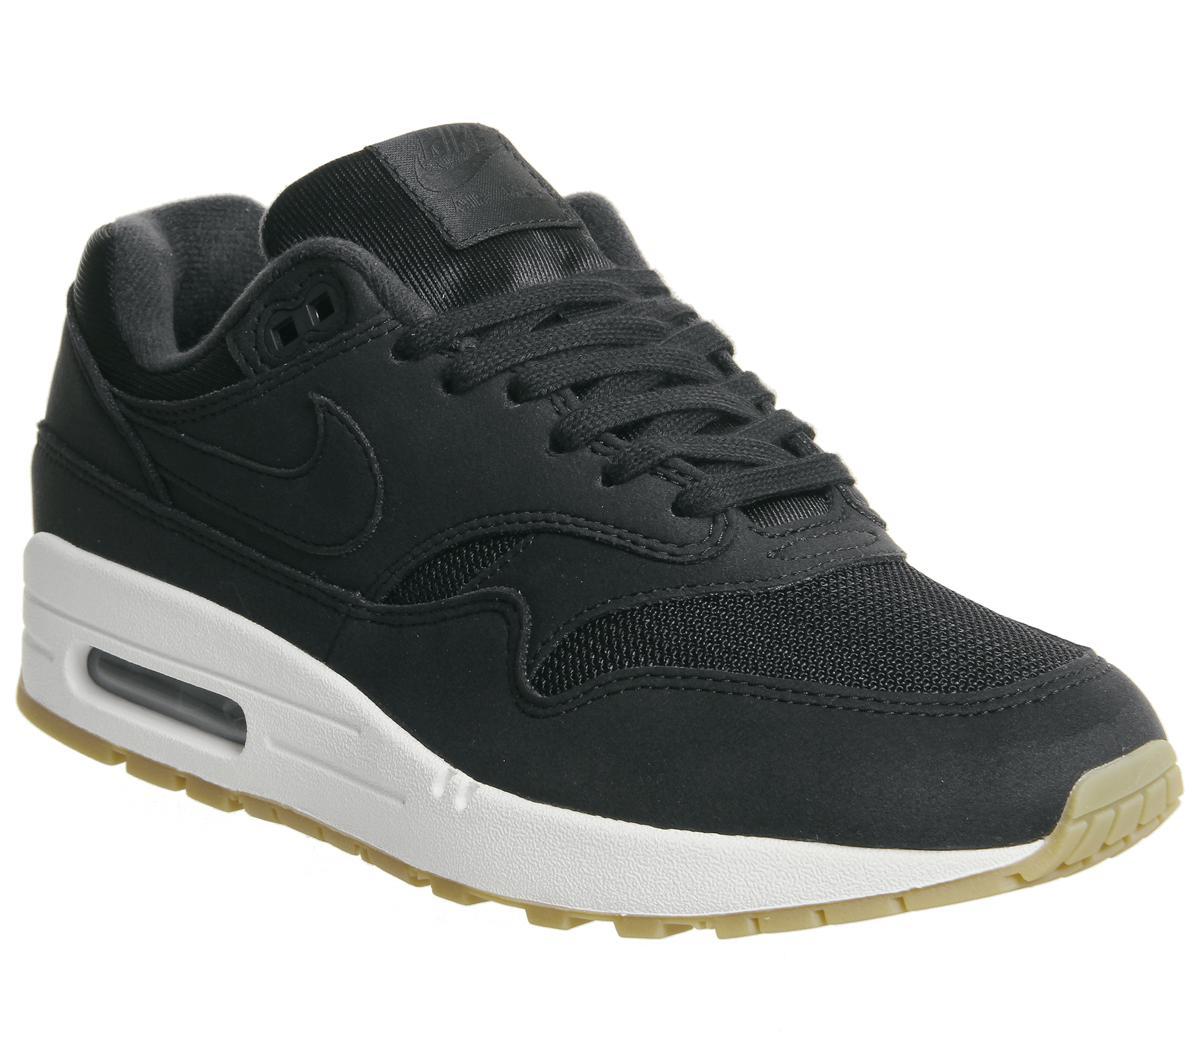 Nike Air Max 1 Trainers Black Gum F